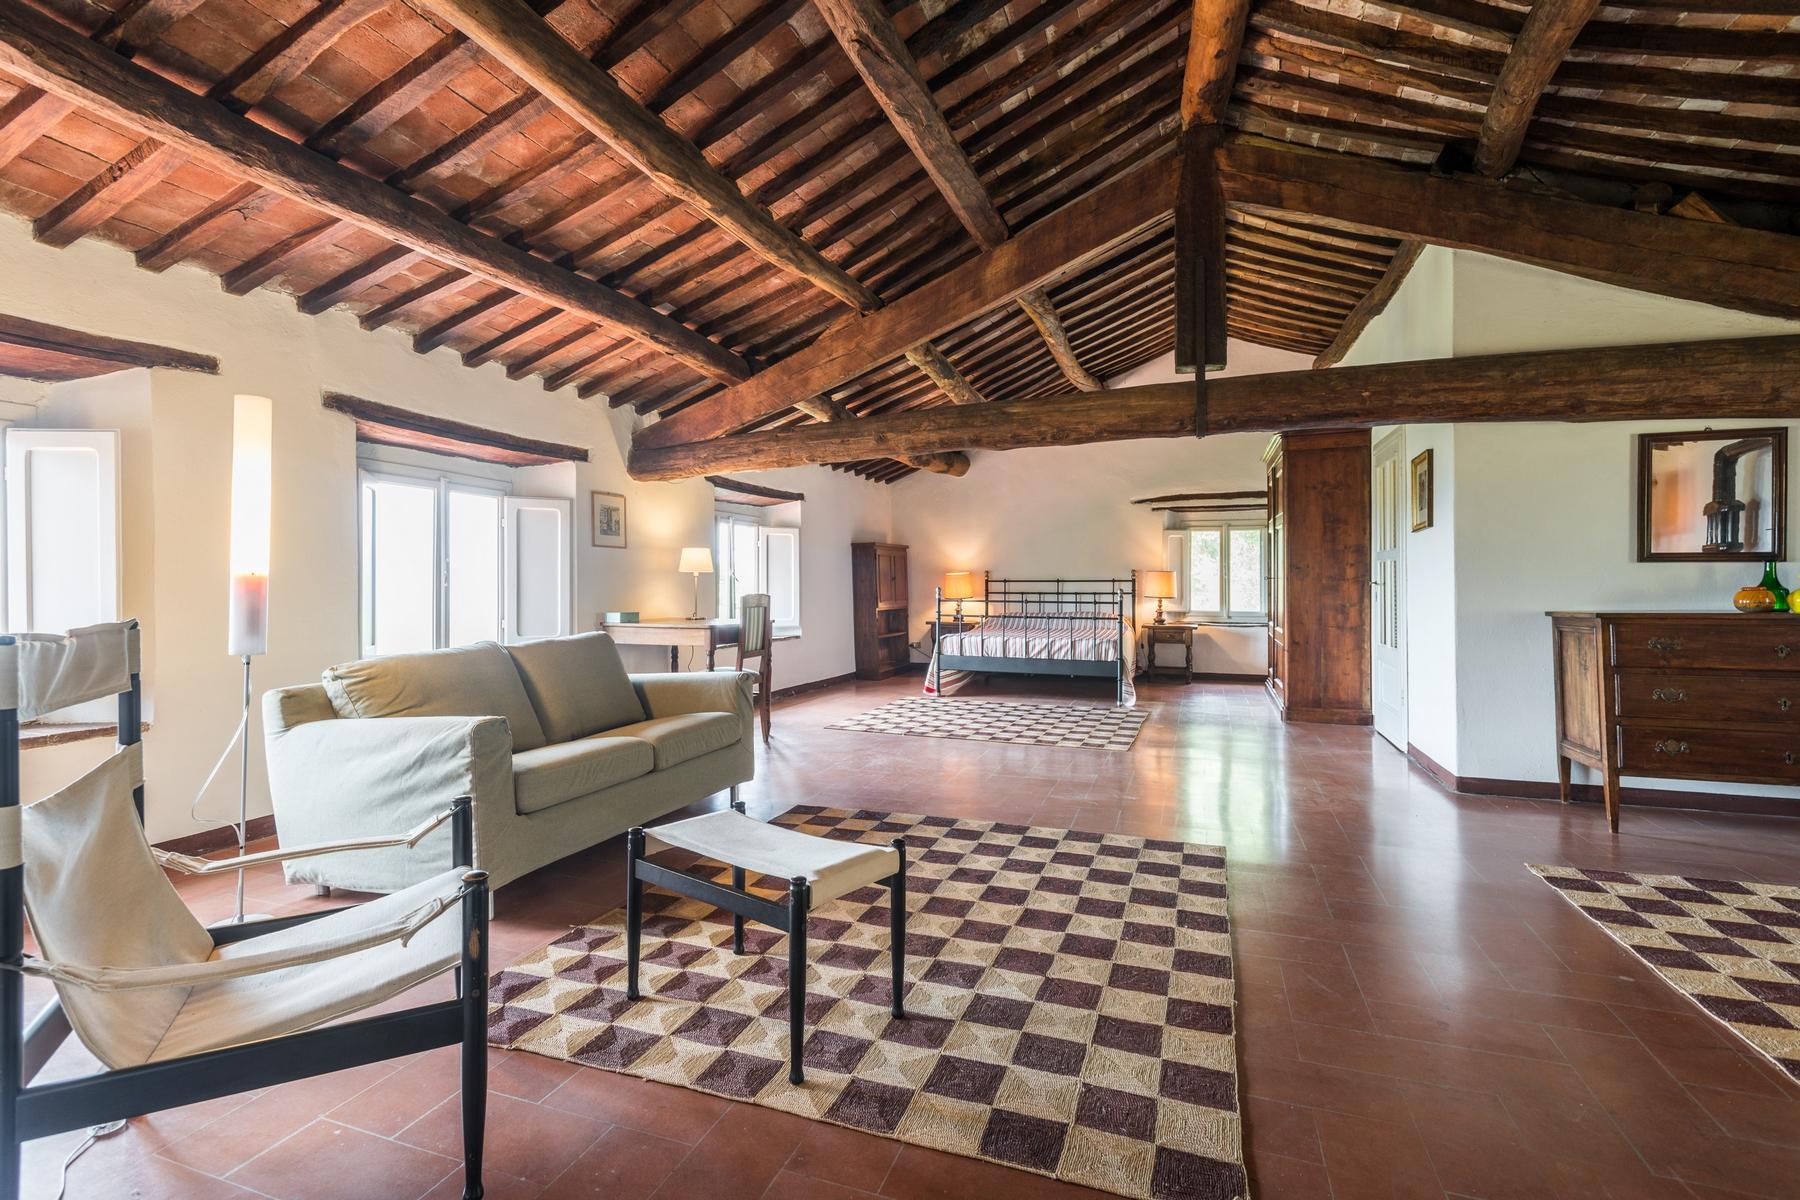 Villa in Vendita a Lucca: 5 locali, 550 mq - Foto 16